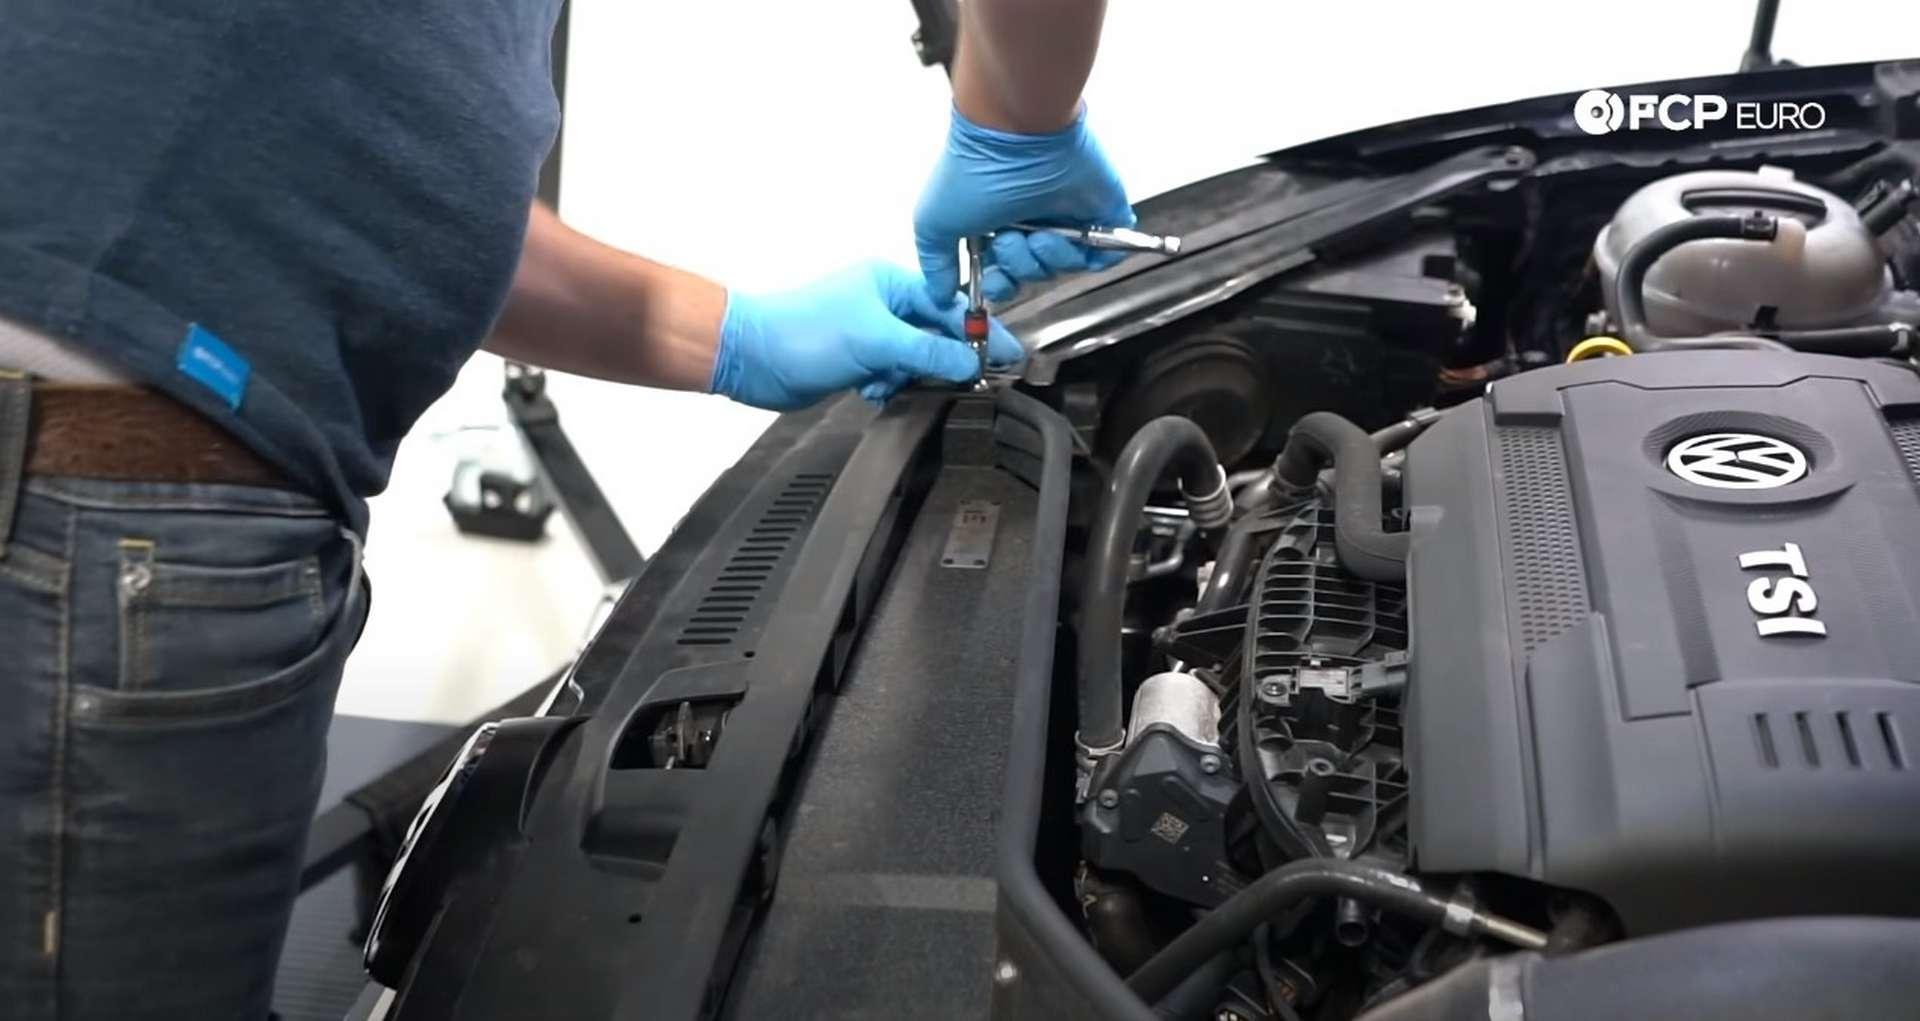 01-DIY_VW_GTI_Clutch-Job-Removing-Intake